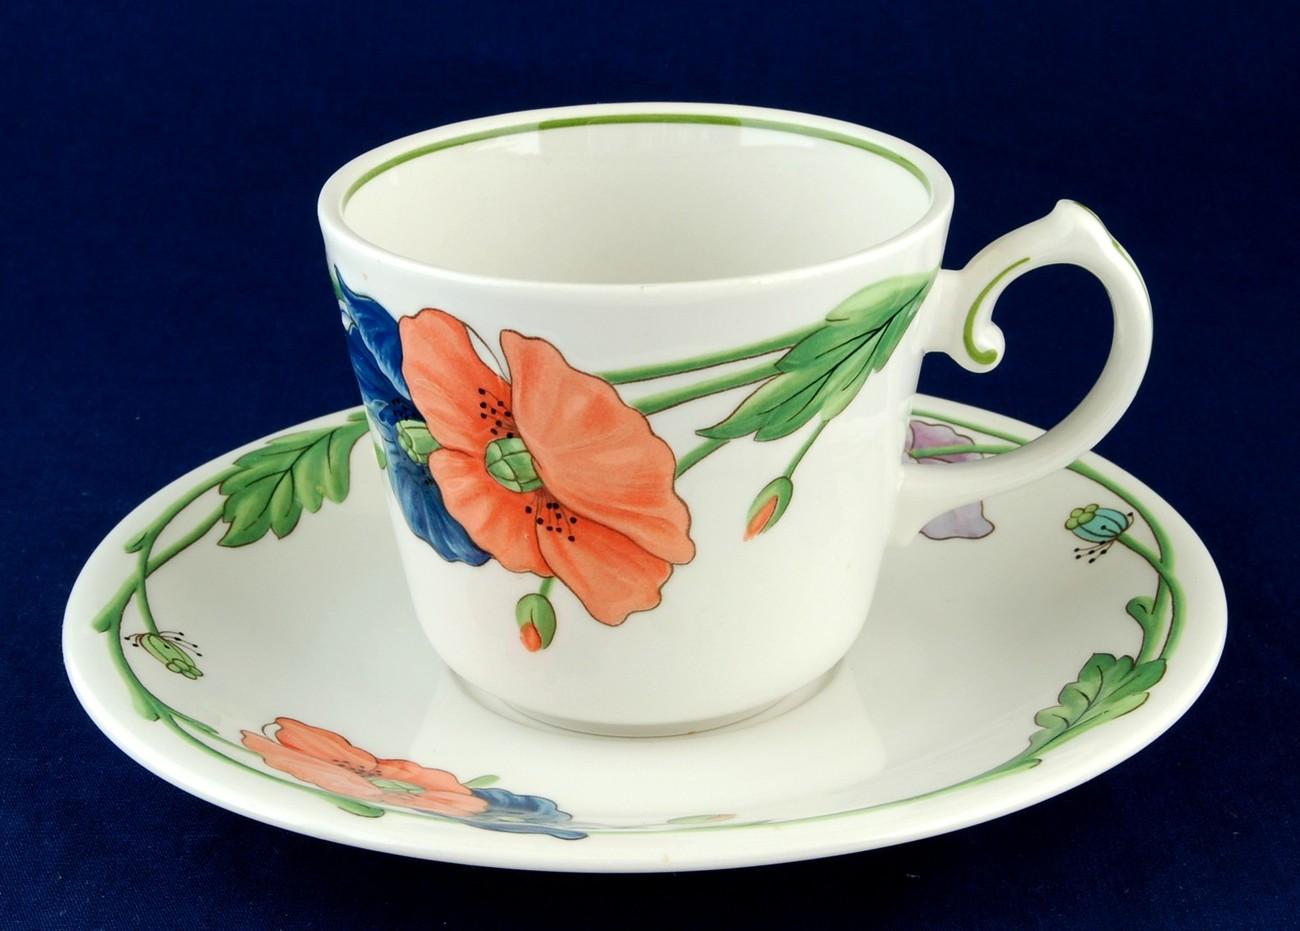 Villeroy boch amapola breakfast cup saucer set - Villeroy and bosh ...